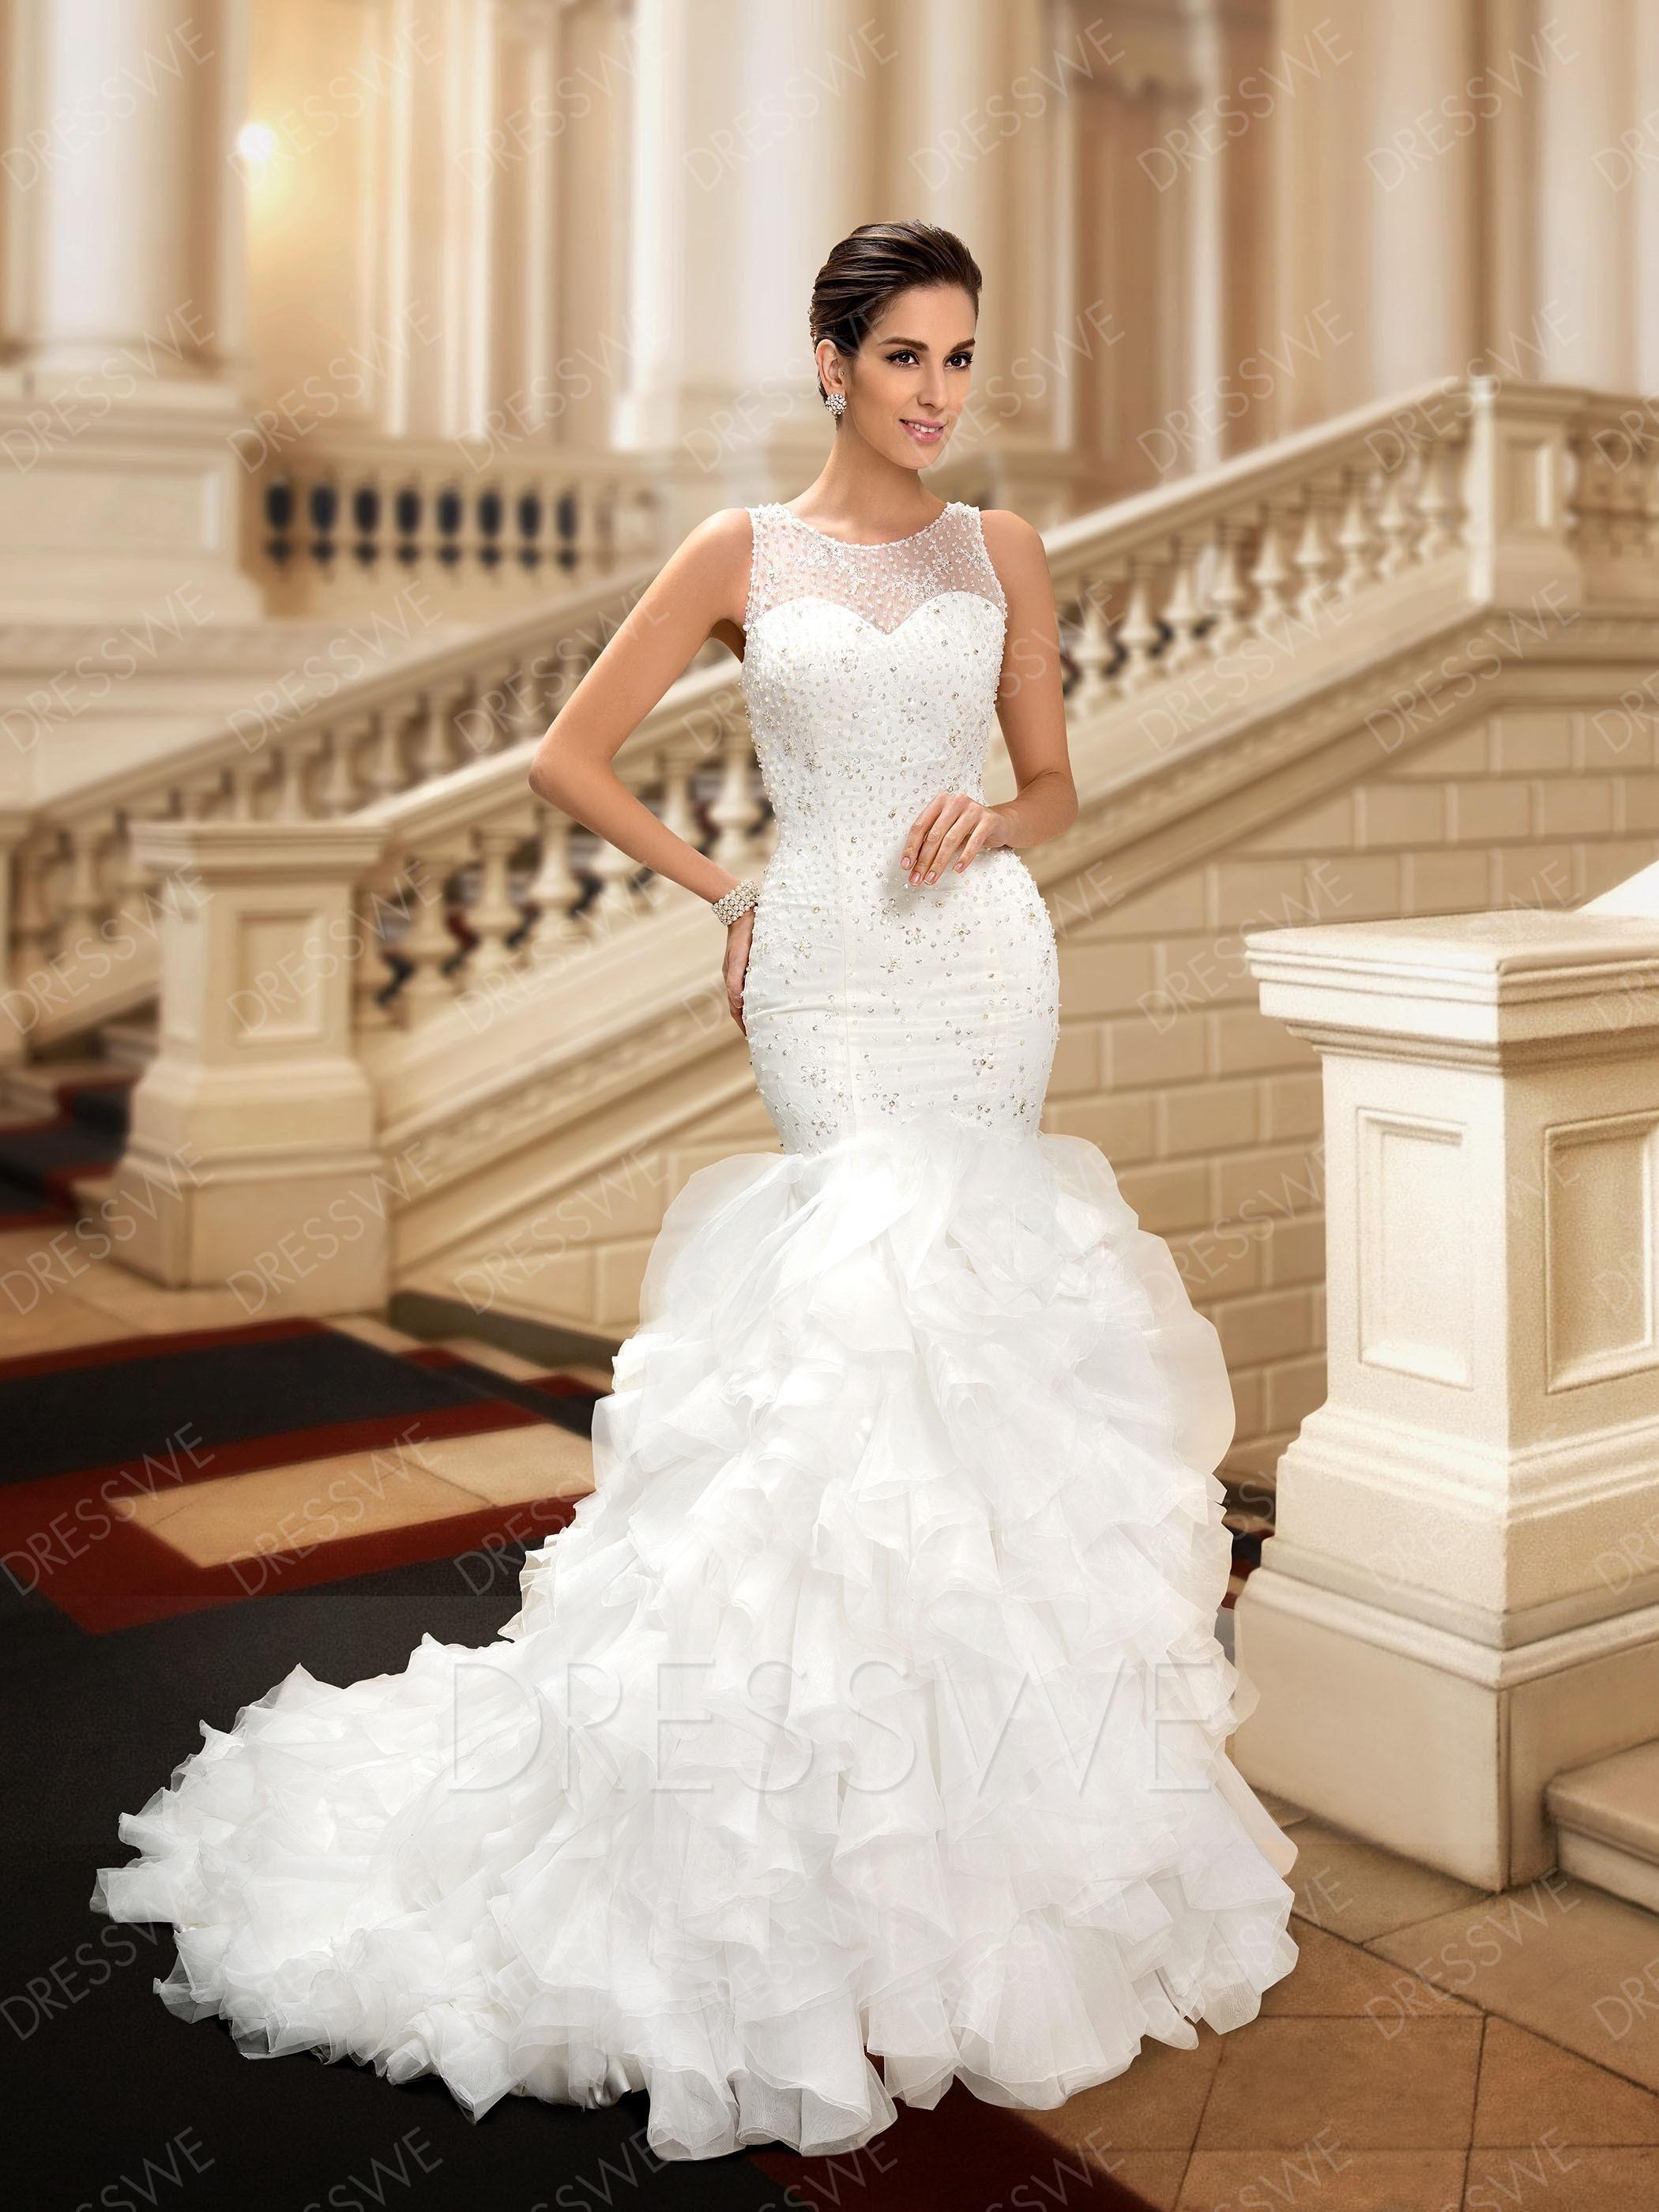 Atlanta wedding dress shops  AdoreWe DressWe DressWe FirstClass Scoop Neck Beading Mermaid